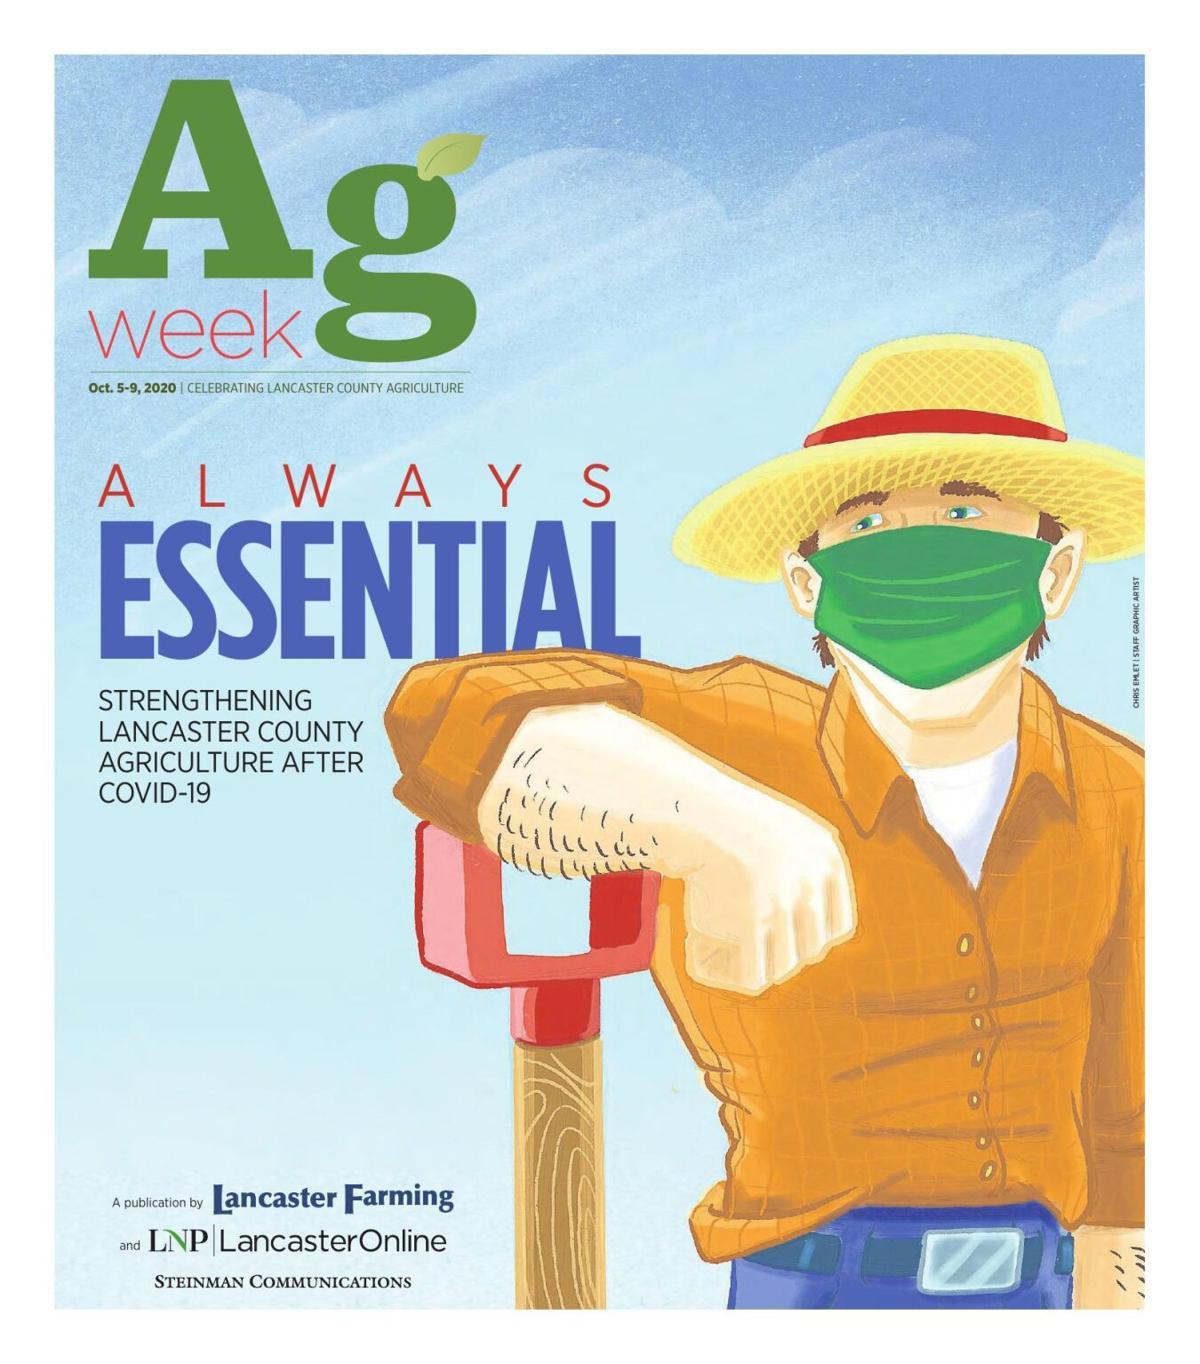 Ag Week Oct. 5-9, 2020